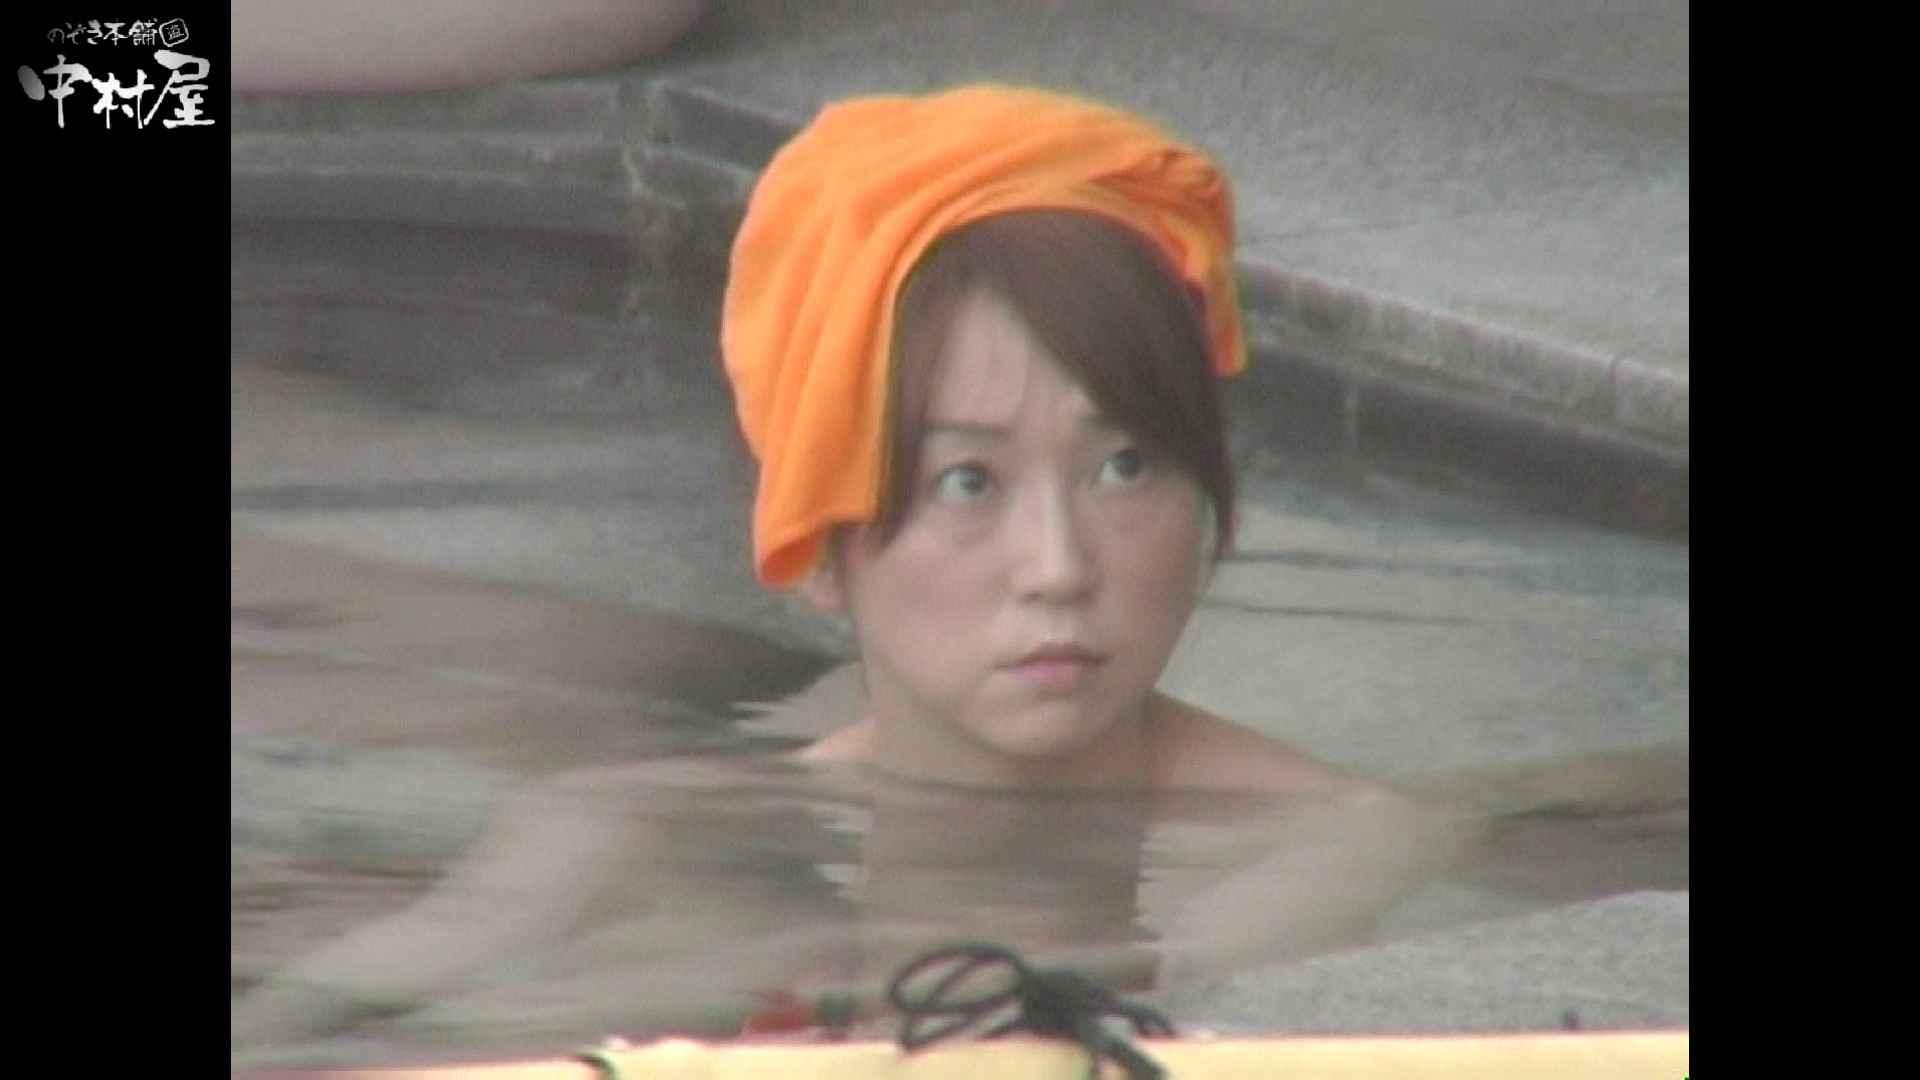 Aquaな露天風呂Vol.941 盗撮師作品  76pic 60